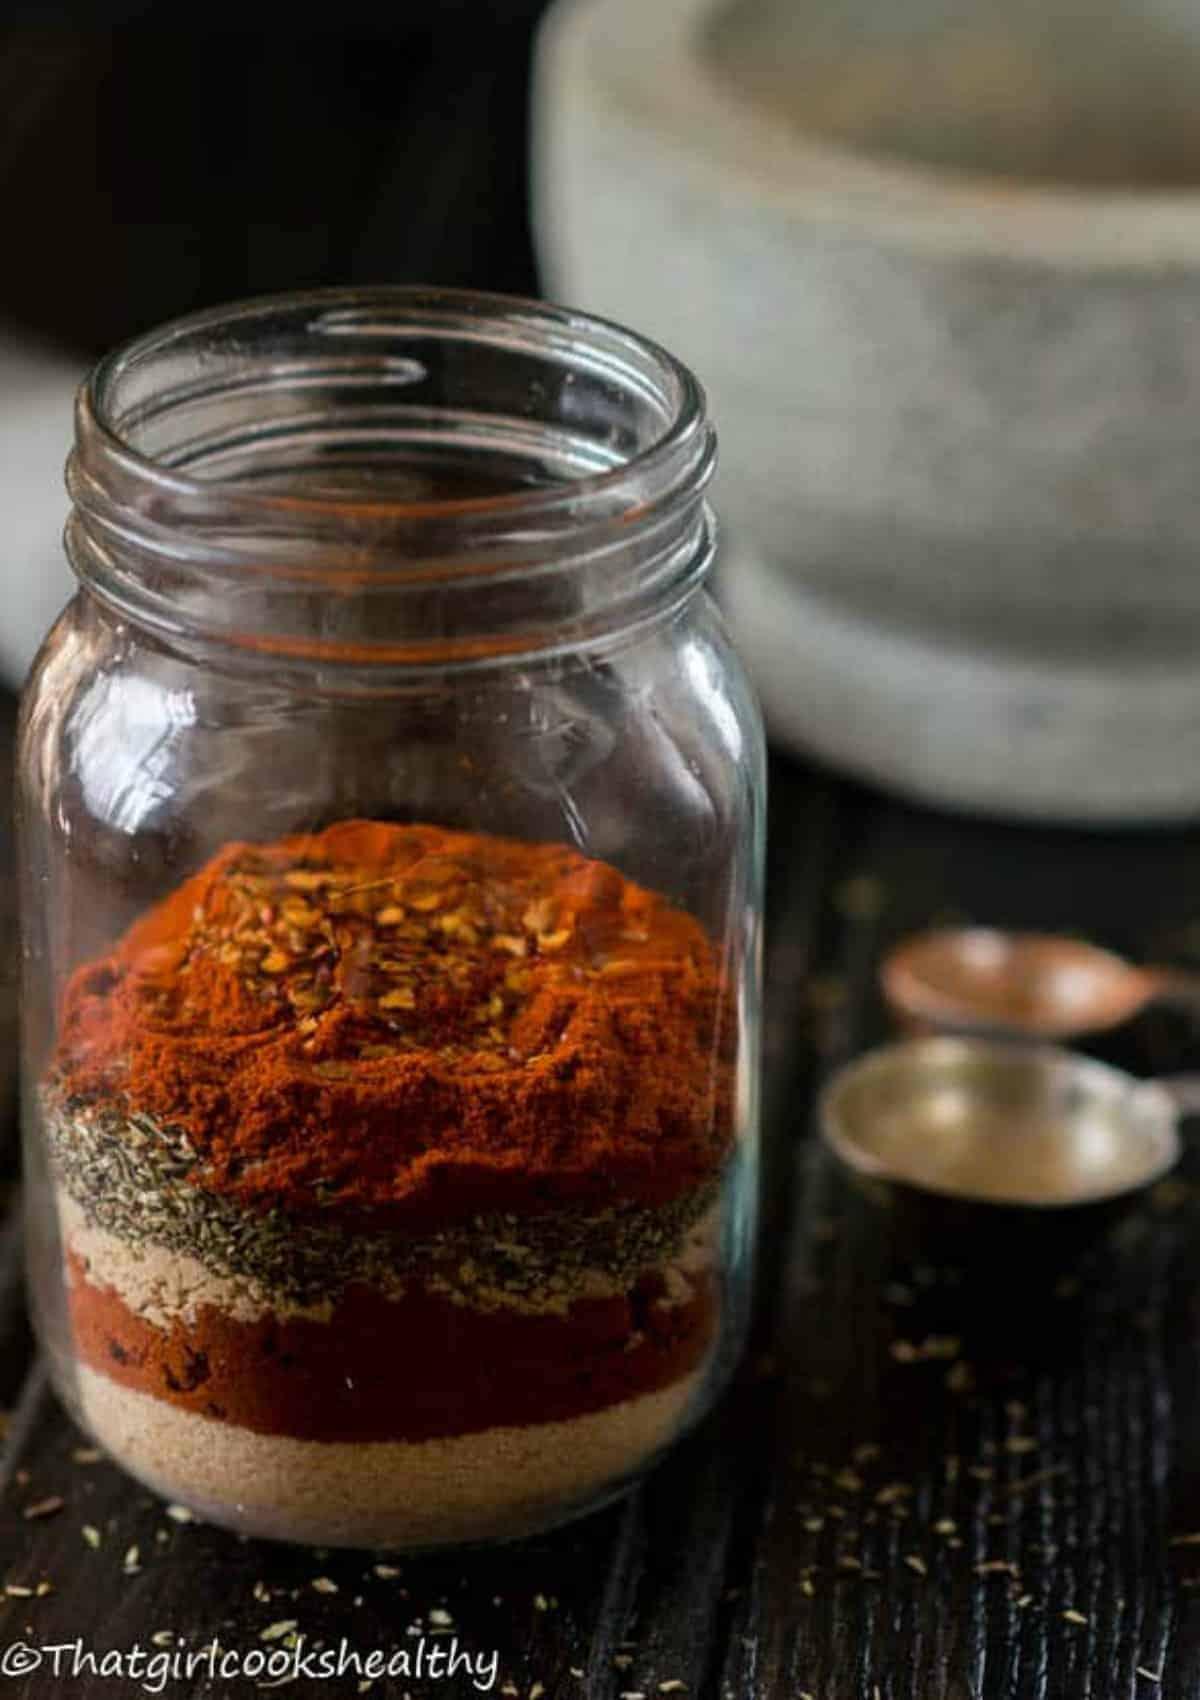 seasoning in a jar with spoon